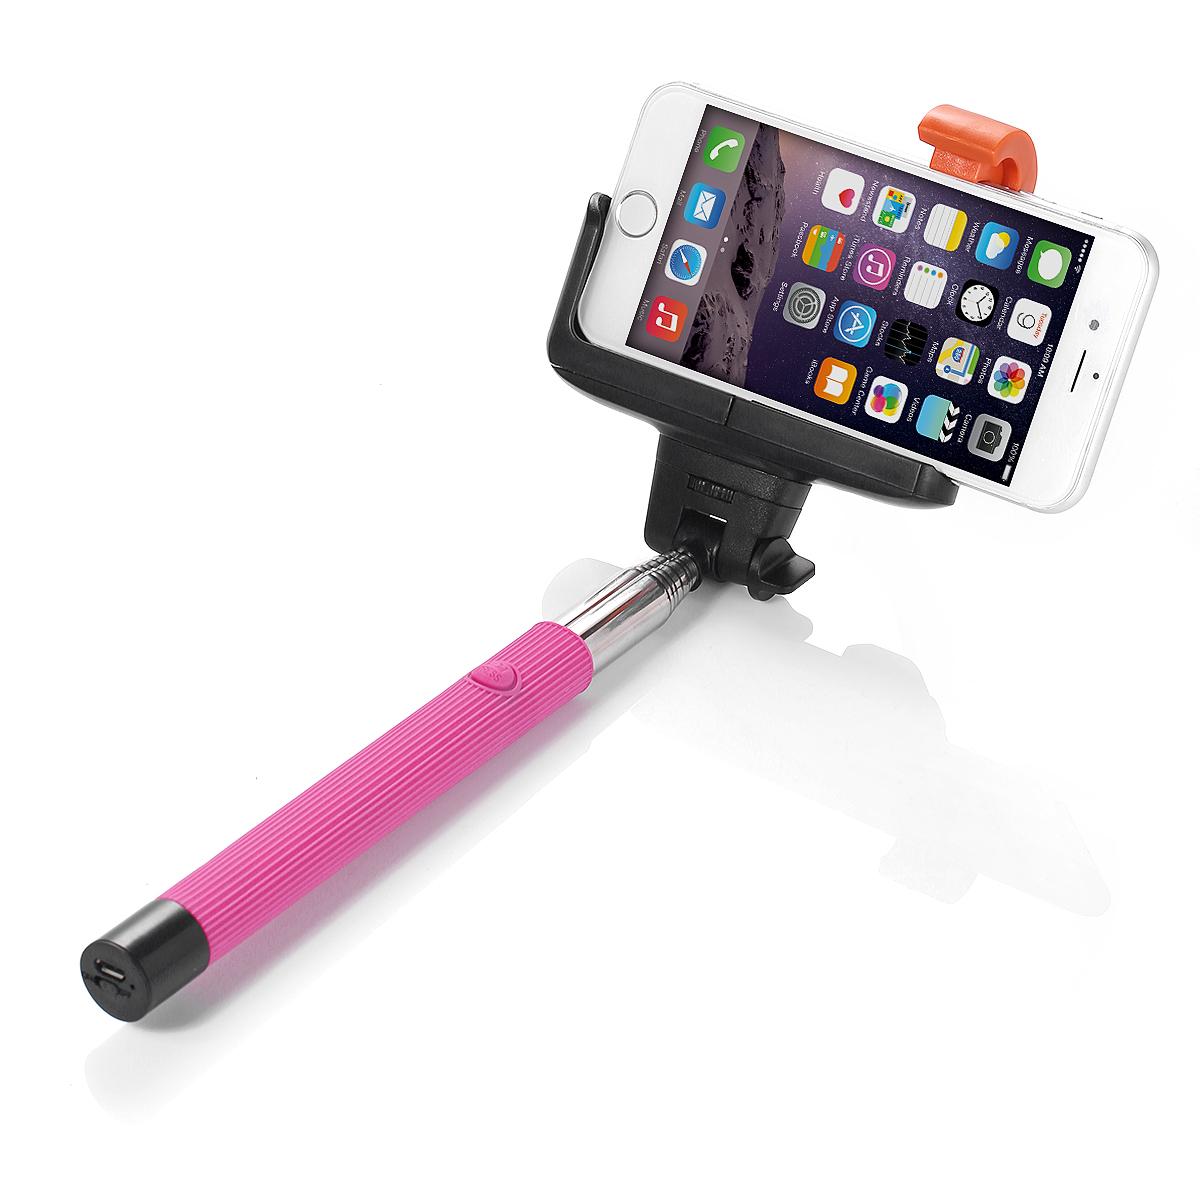 monopod selfie stick iphone 6 instructions